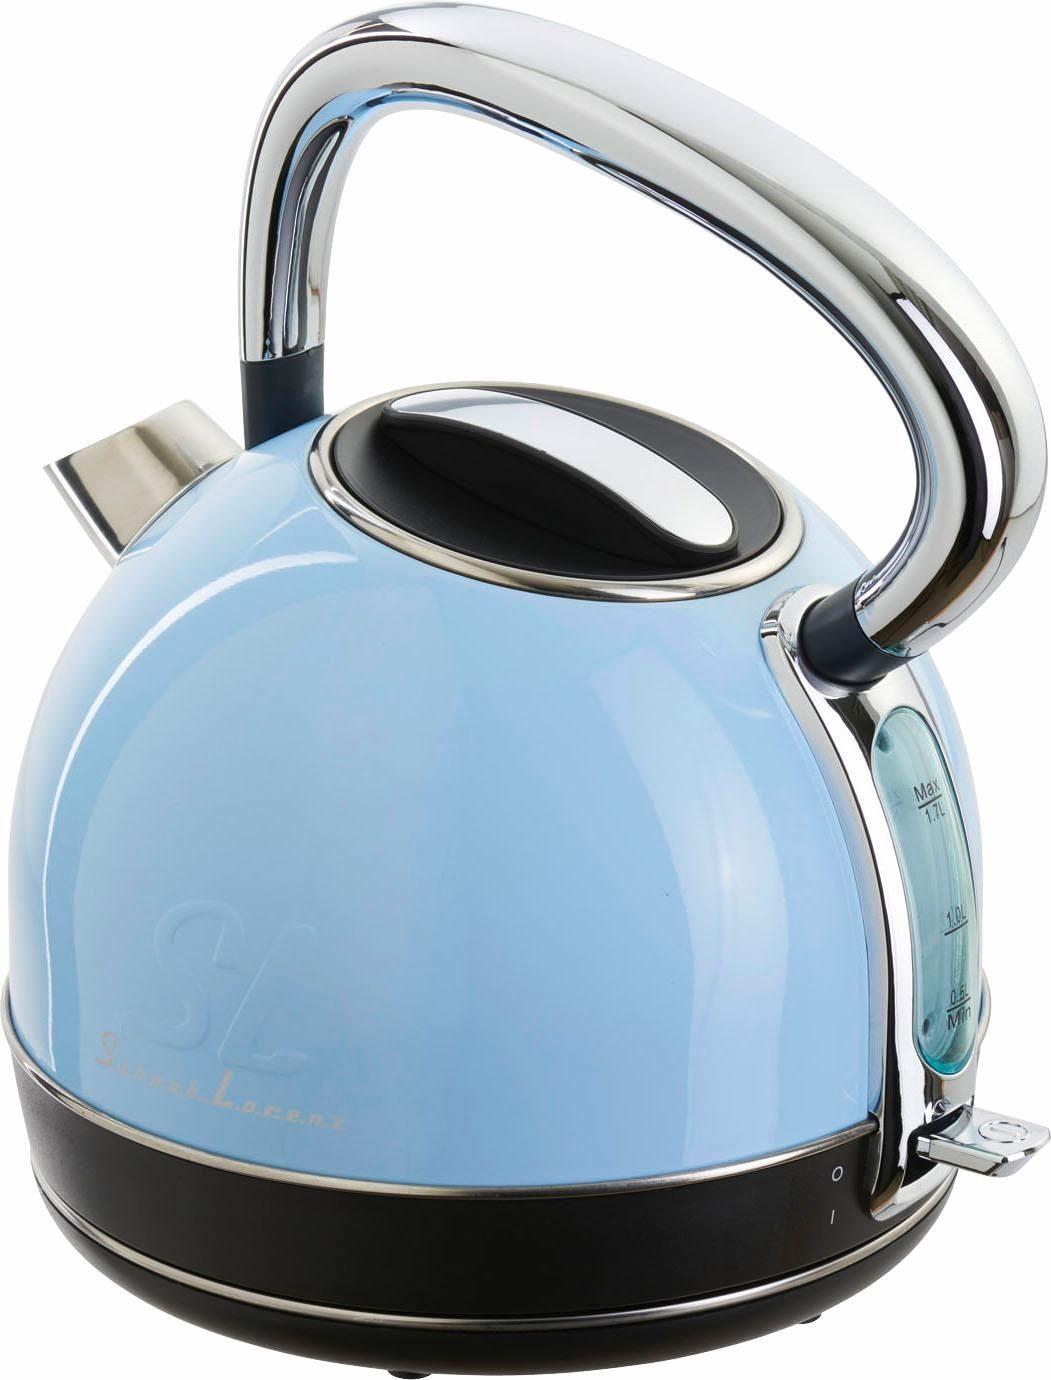 Schaub Lorenz Wasserkocher W1 SLB, 1,7 Liter, 1850-2200 Watt, blau